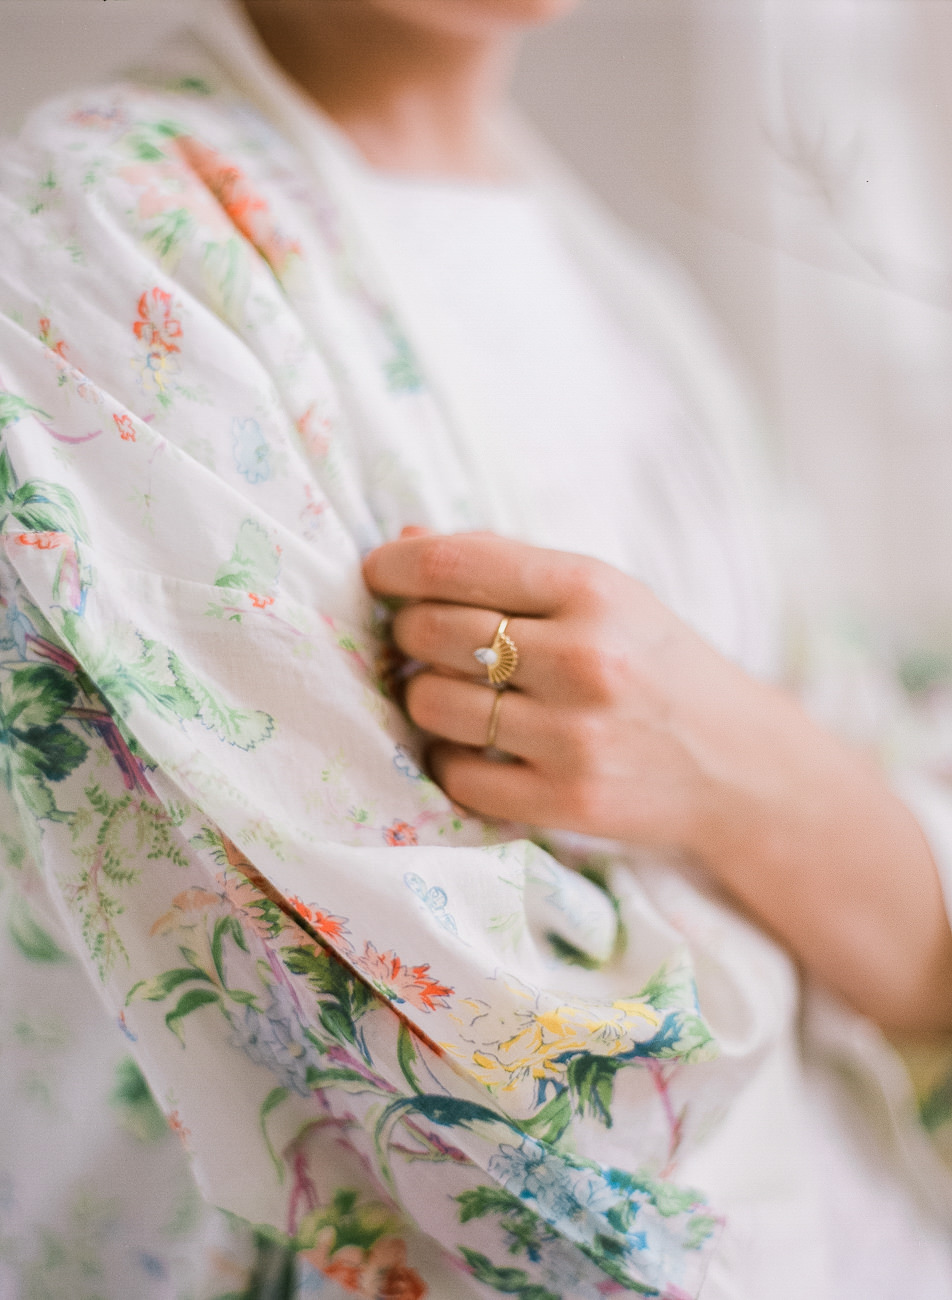 marrakech-photographe-mariage-alain-m-5.jpg